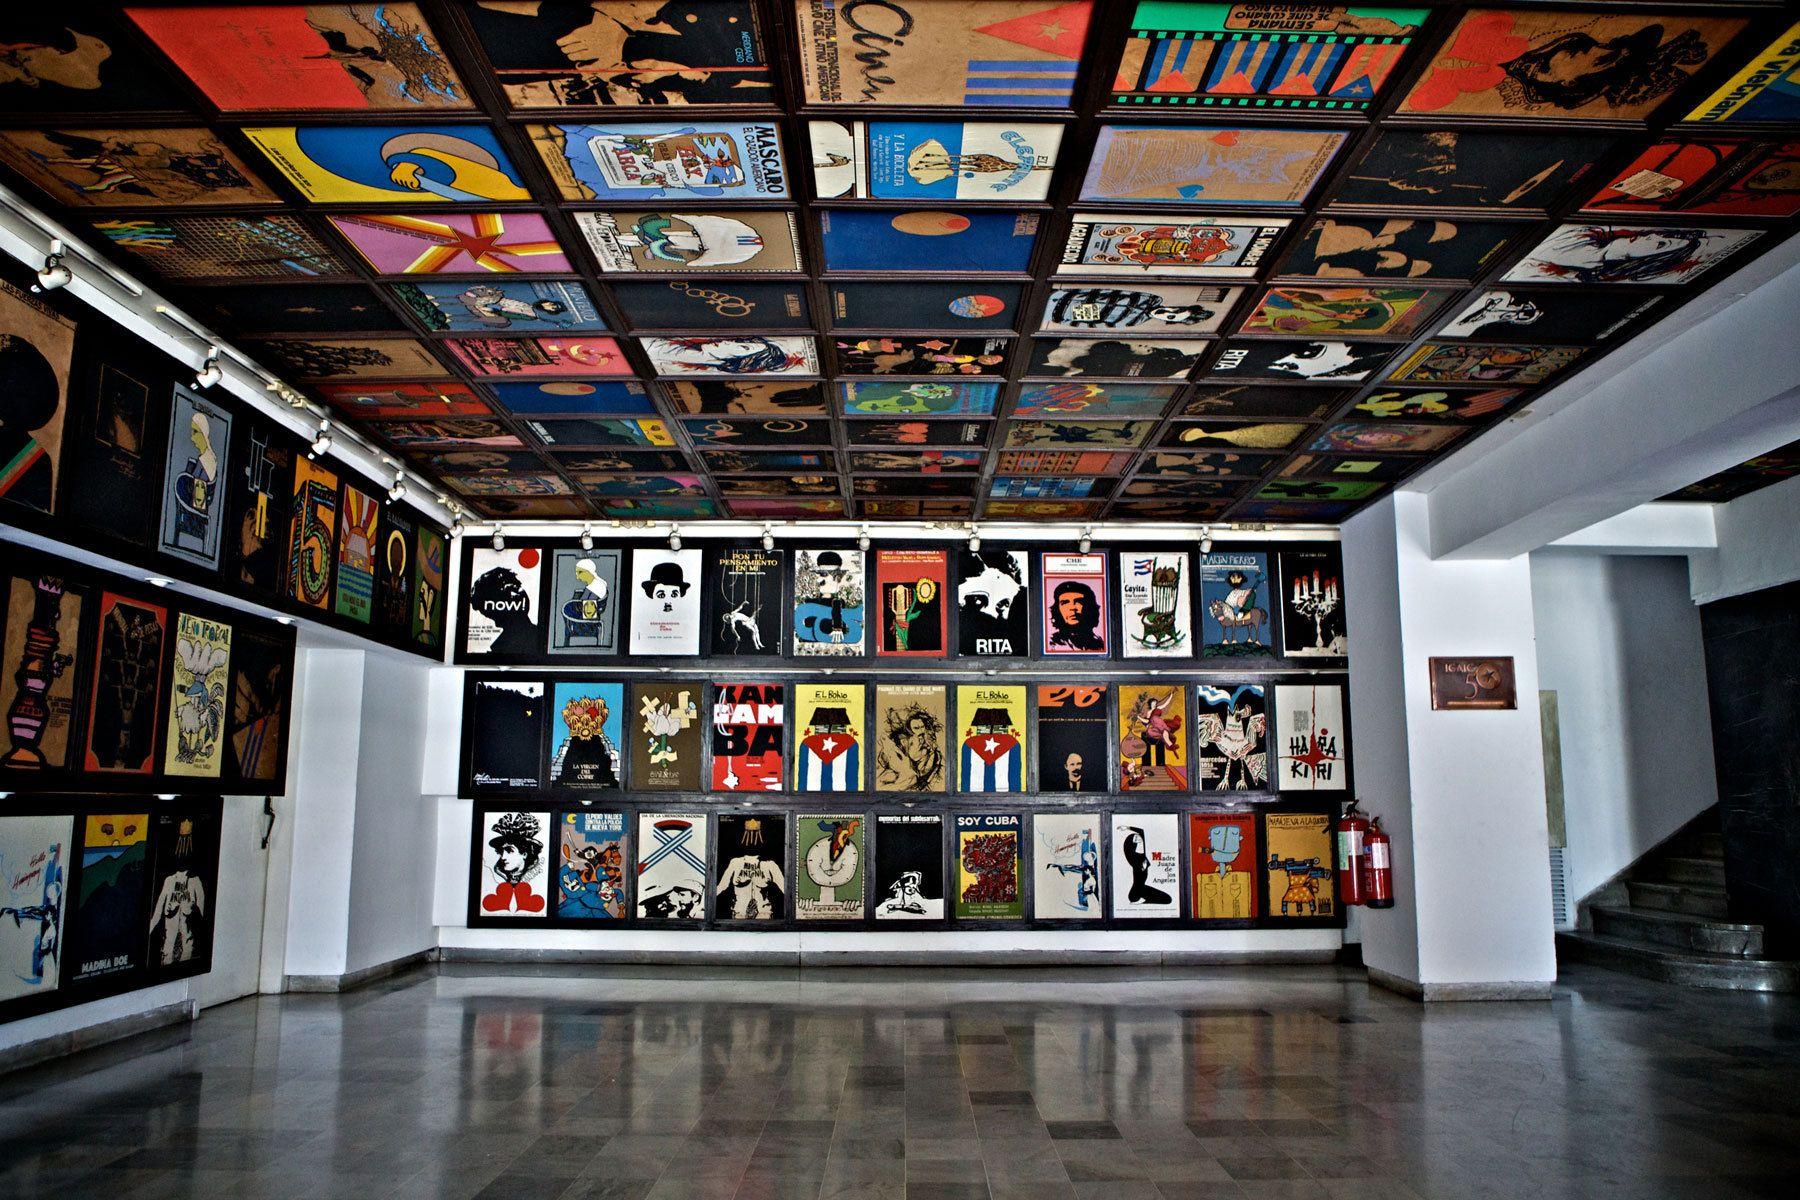 1cine_chaplin_cuba_movie_posters_havana_cuba.jpg